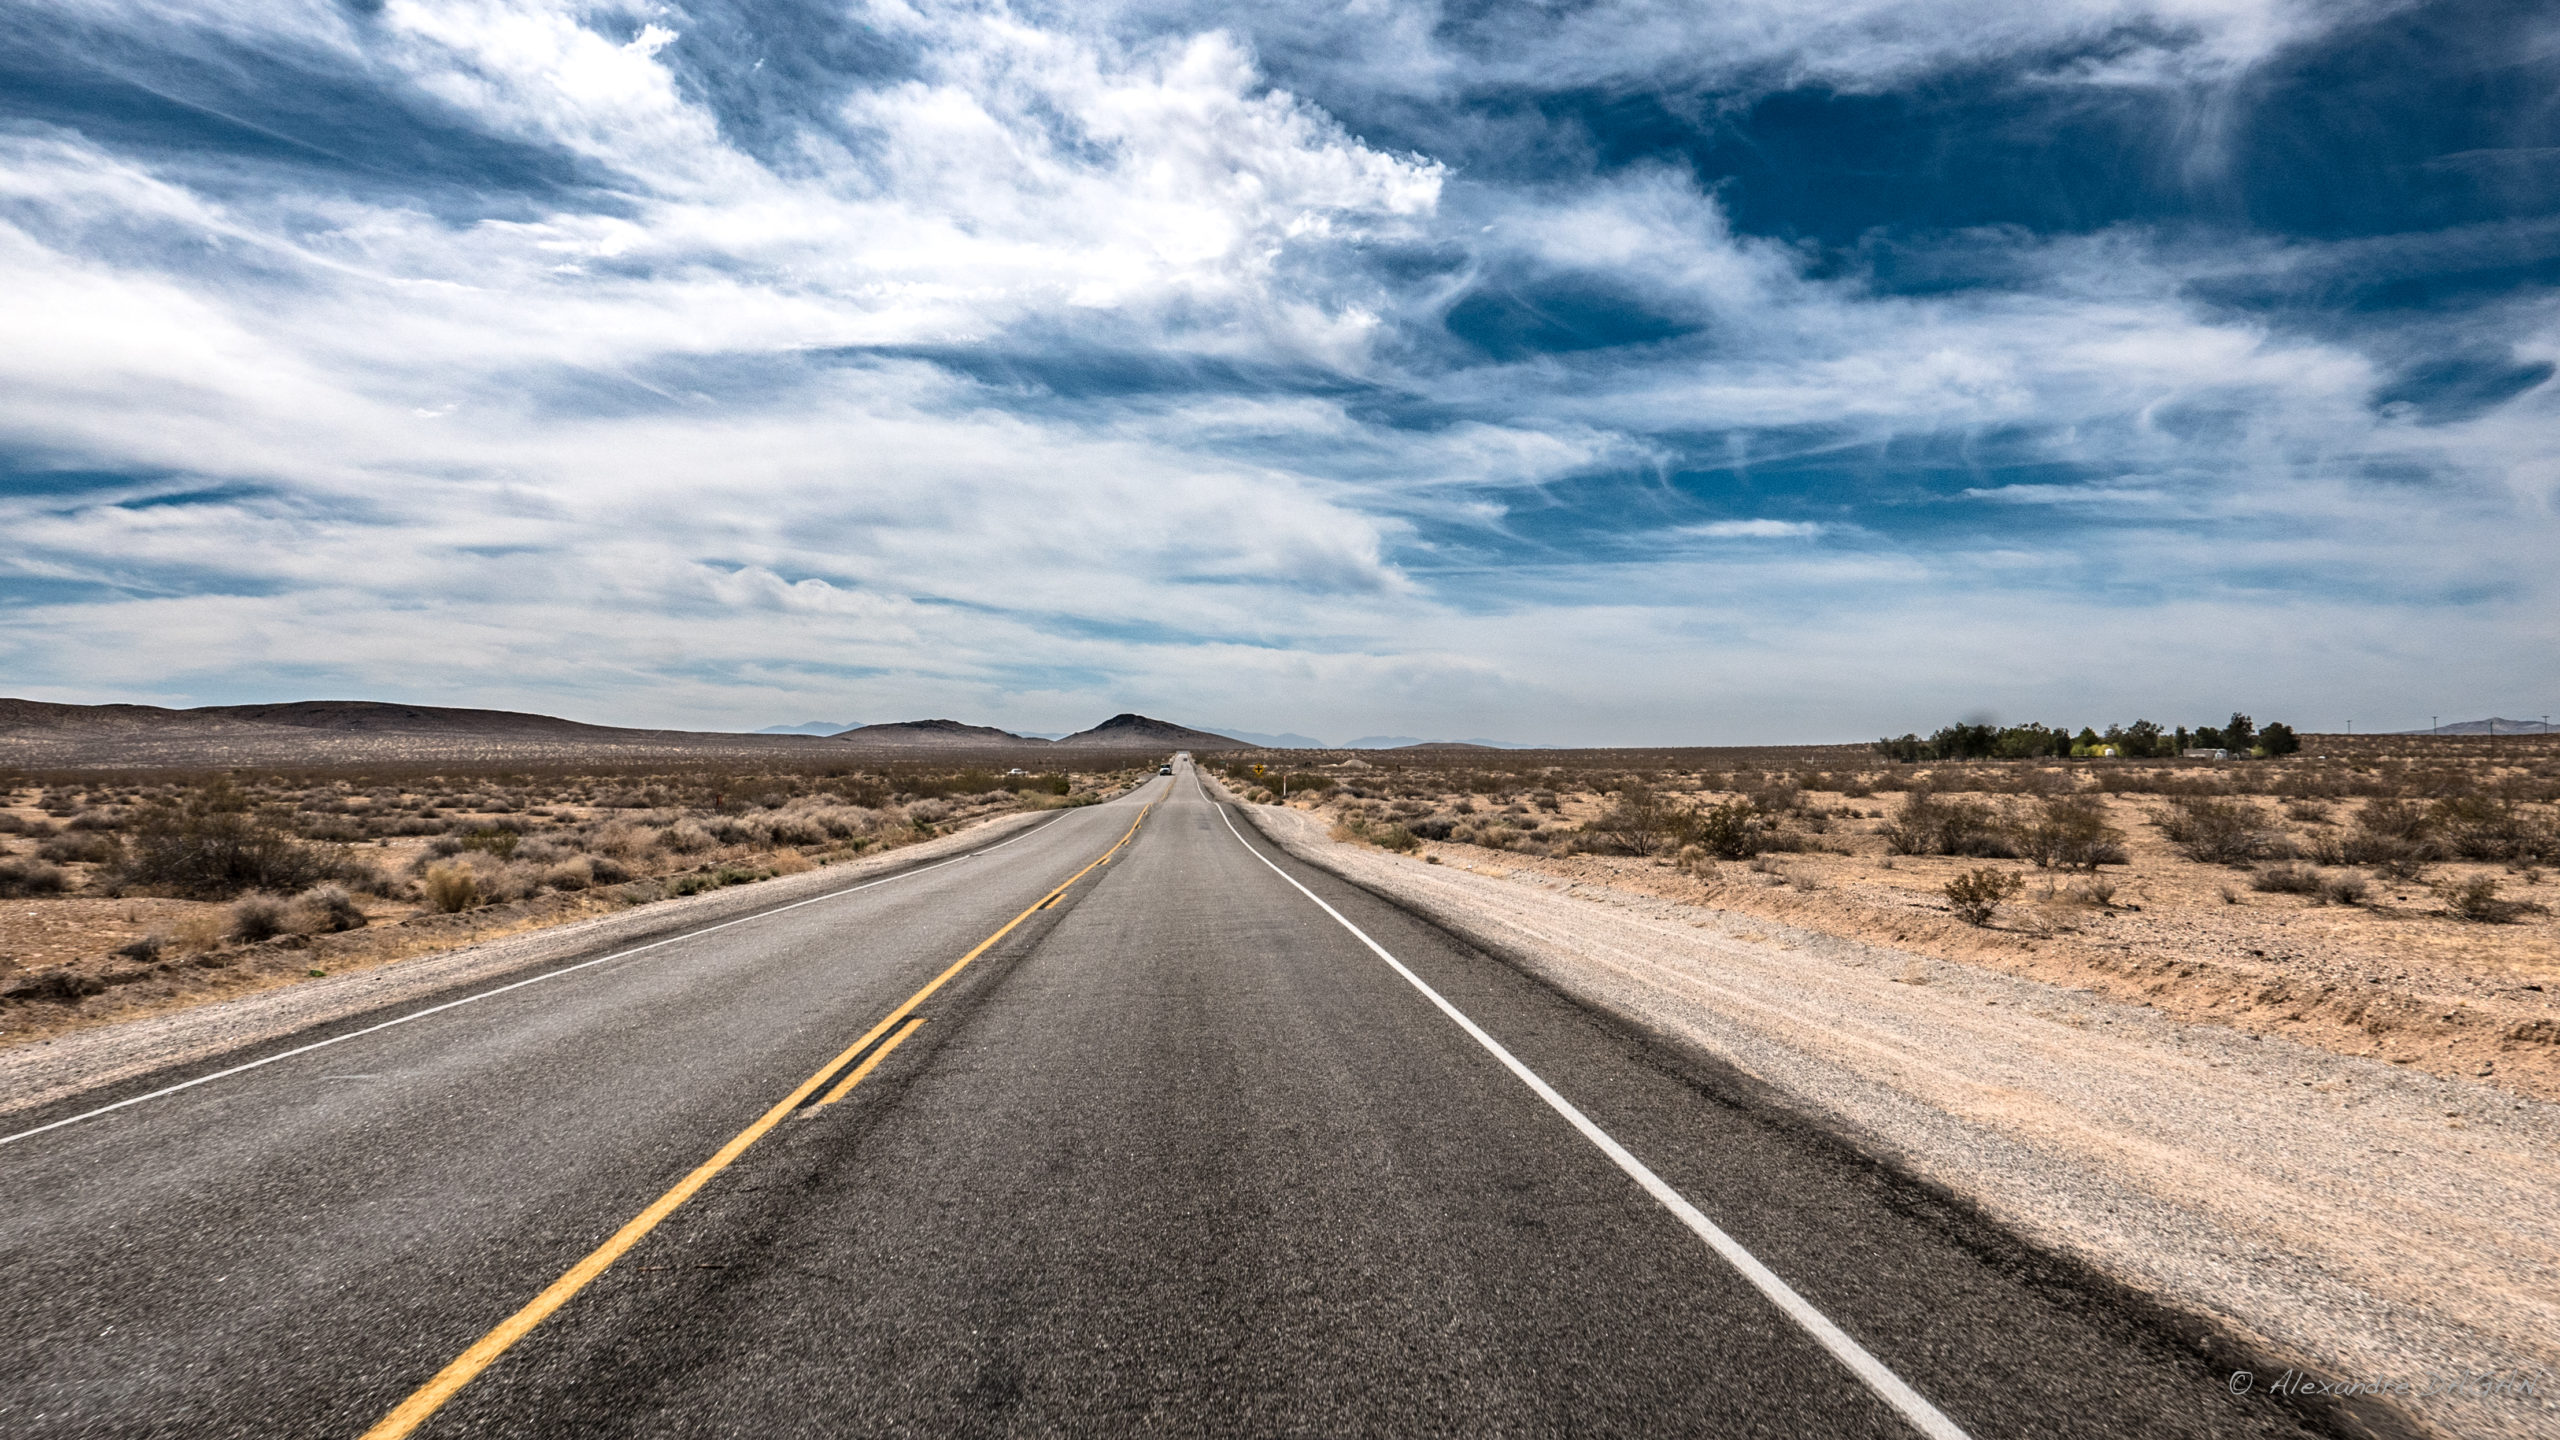 66 Road, California, United States